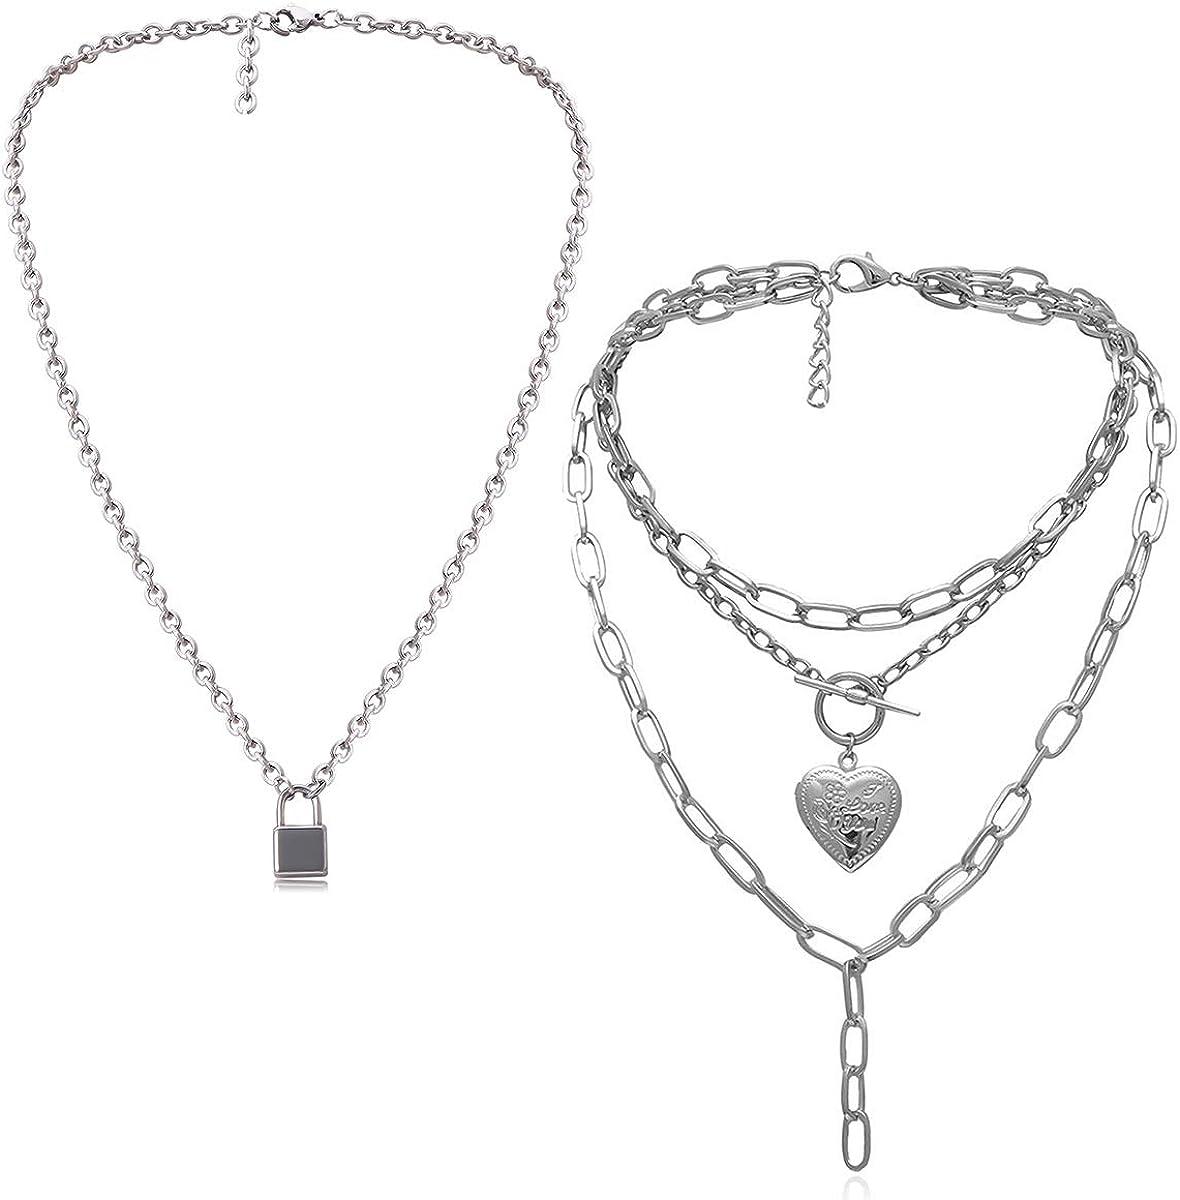 Ingemark Statement Cool Punk Chunky Chain Toggle Necklace for Women Girls Heart Shaped Photo Locket Pendant Layered Pearl Choker Necklace (Style 5 Heart Lock Pendant)